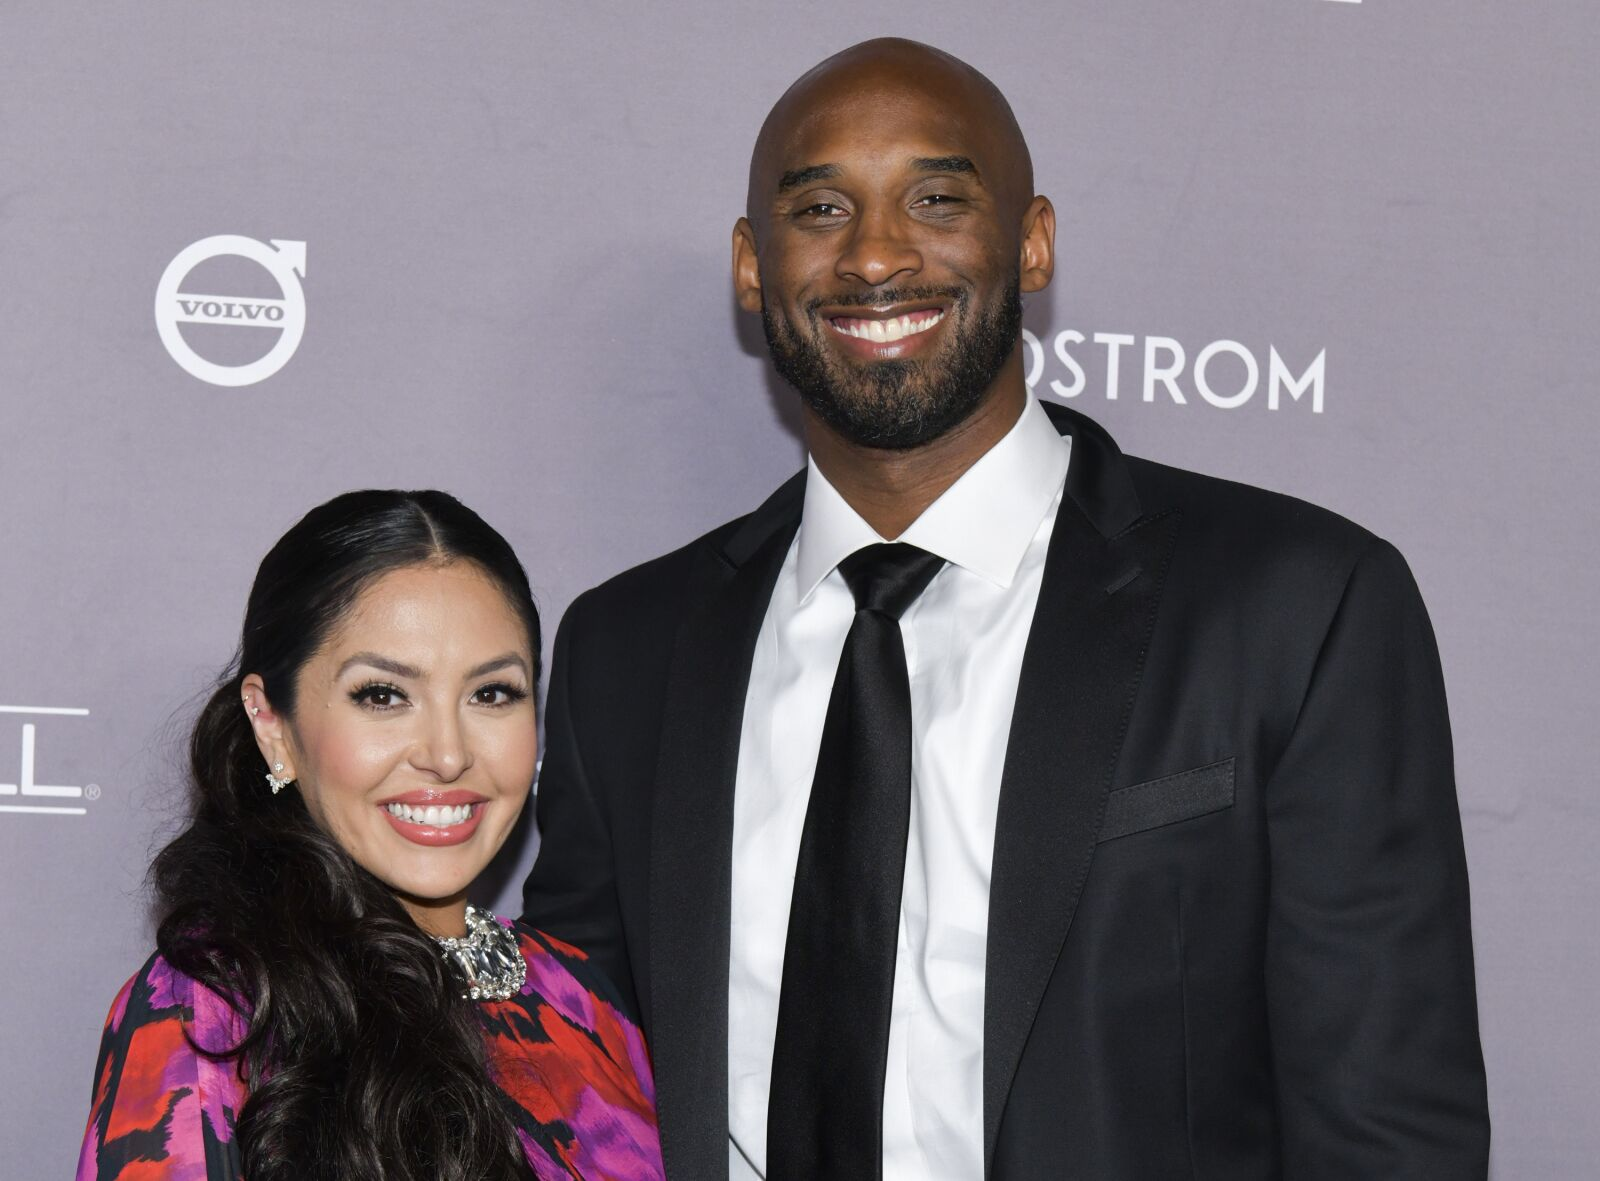 Chicago Bulls: Remembering Kobe Bryant amid shocking reports